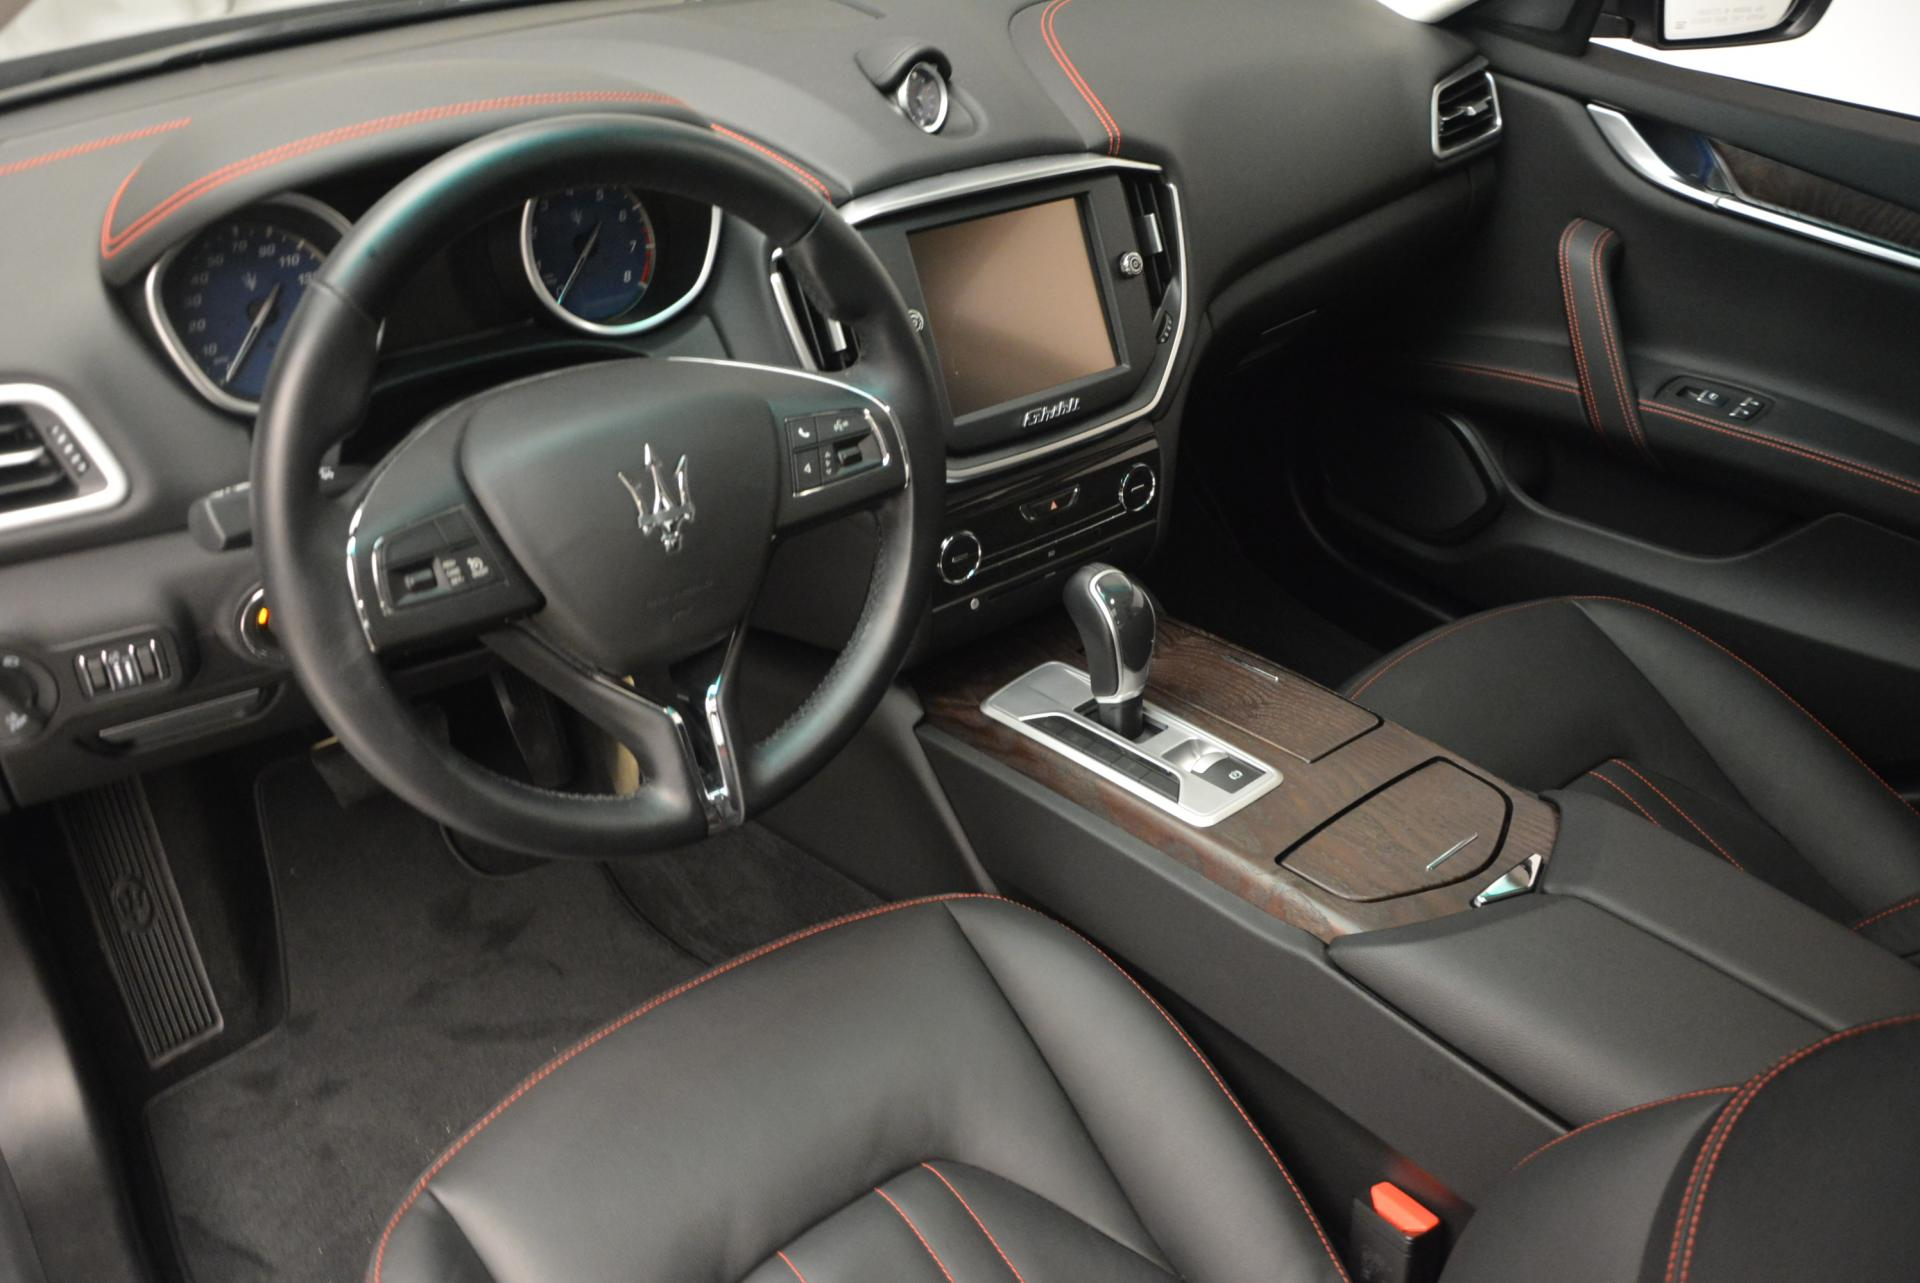 Used 2016 Maserati Ghibli S Q4 For Sale In Greenwich, CT 192_p22